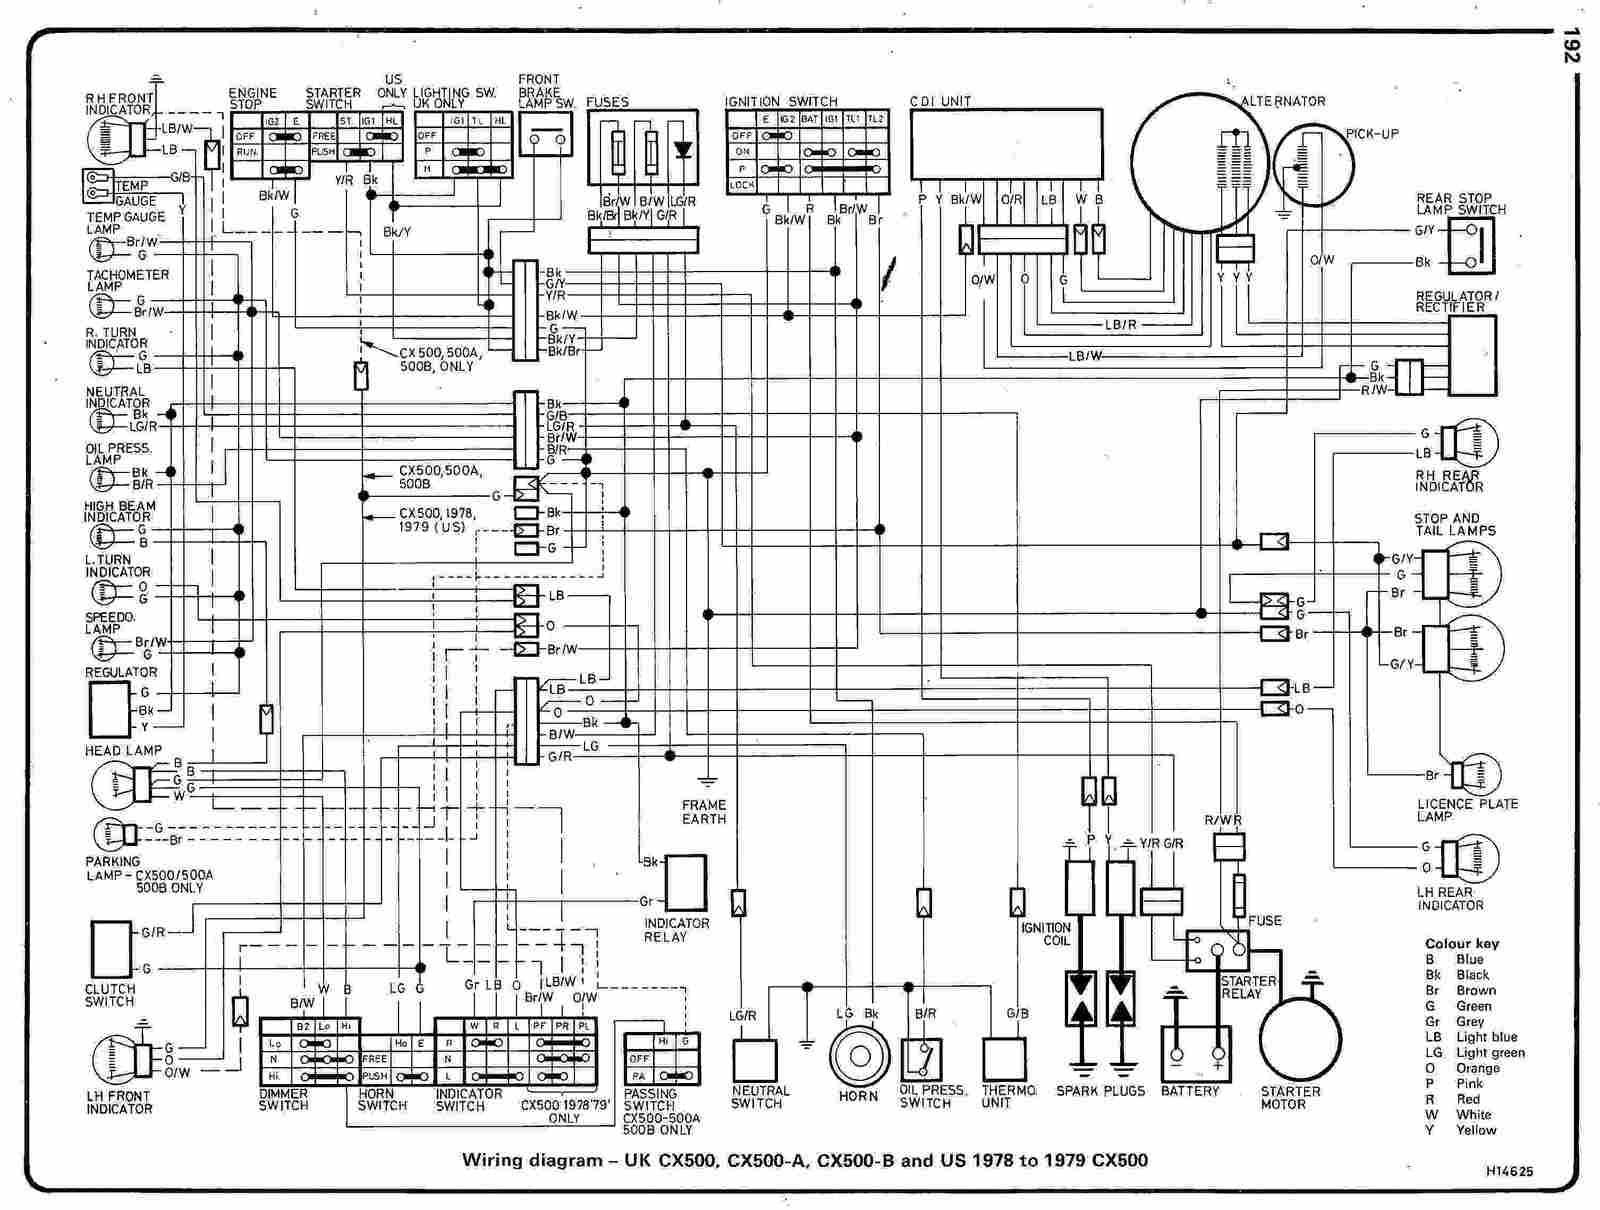 1977 Jeep Cj7 Electrical Diagram  Somurich